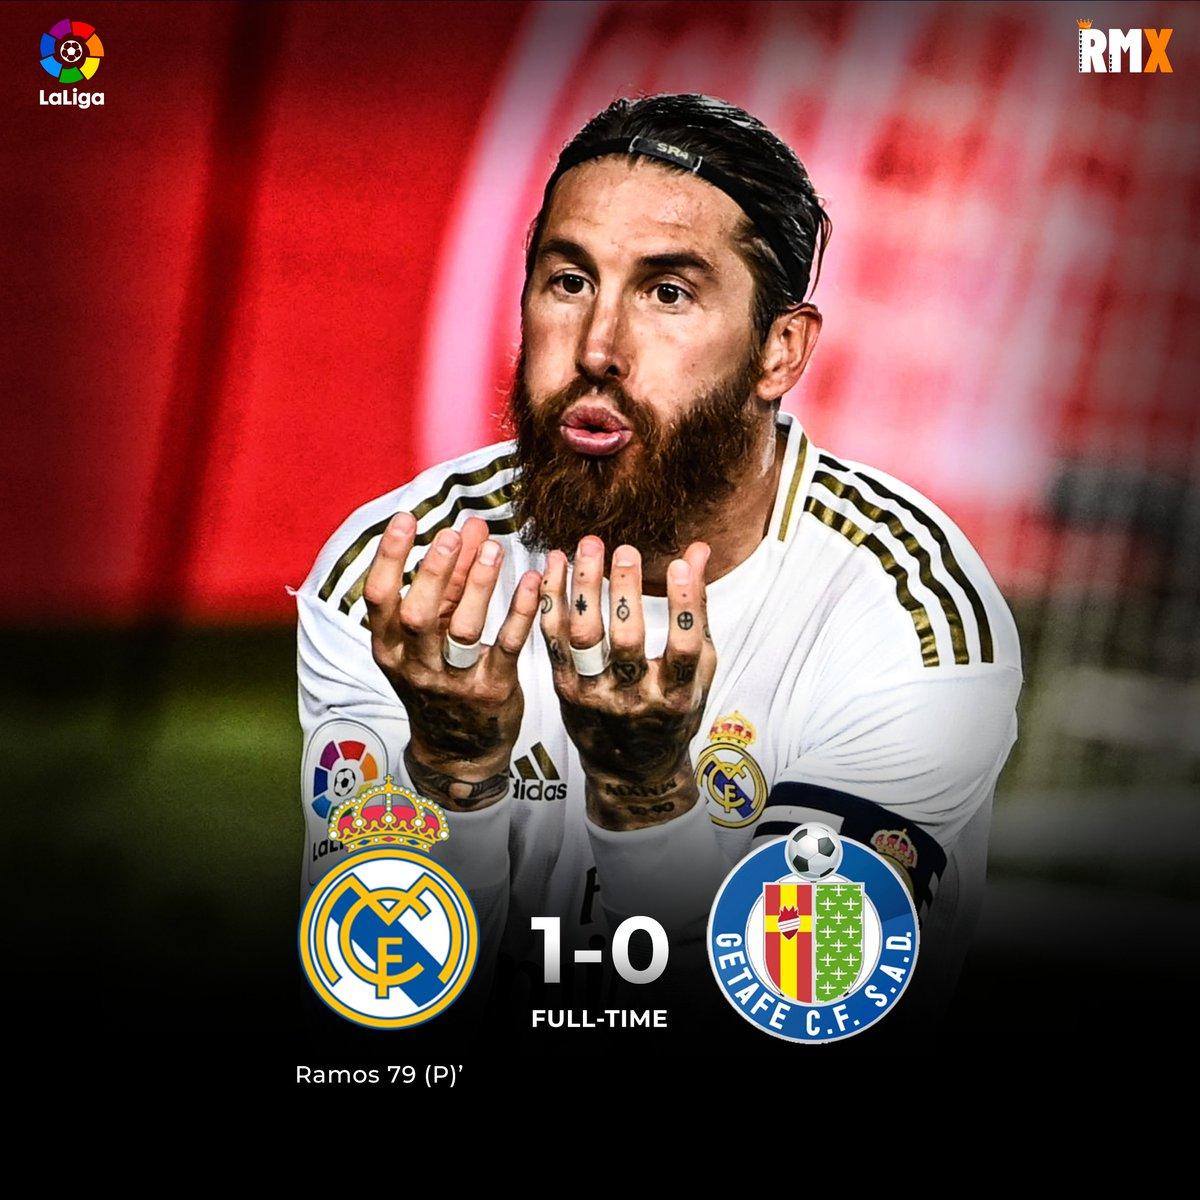 Chấm điểm trận Real Madrid 1-0 Getafe - 2